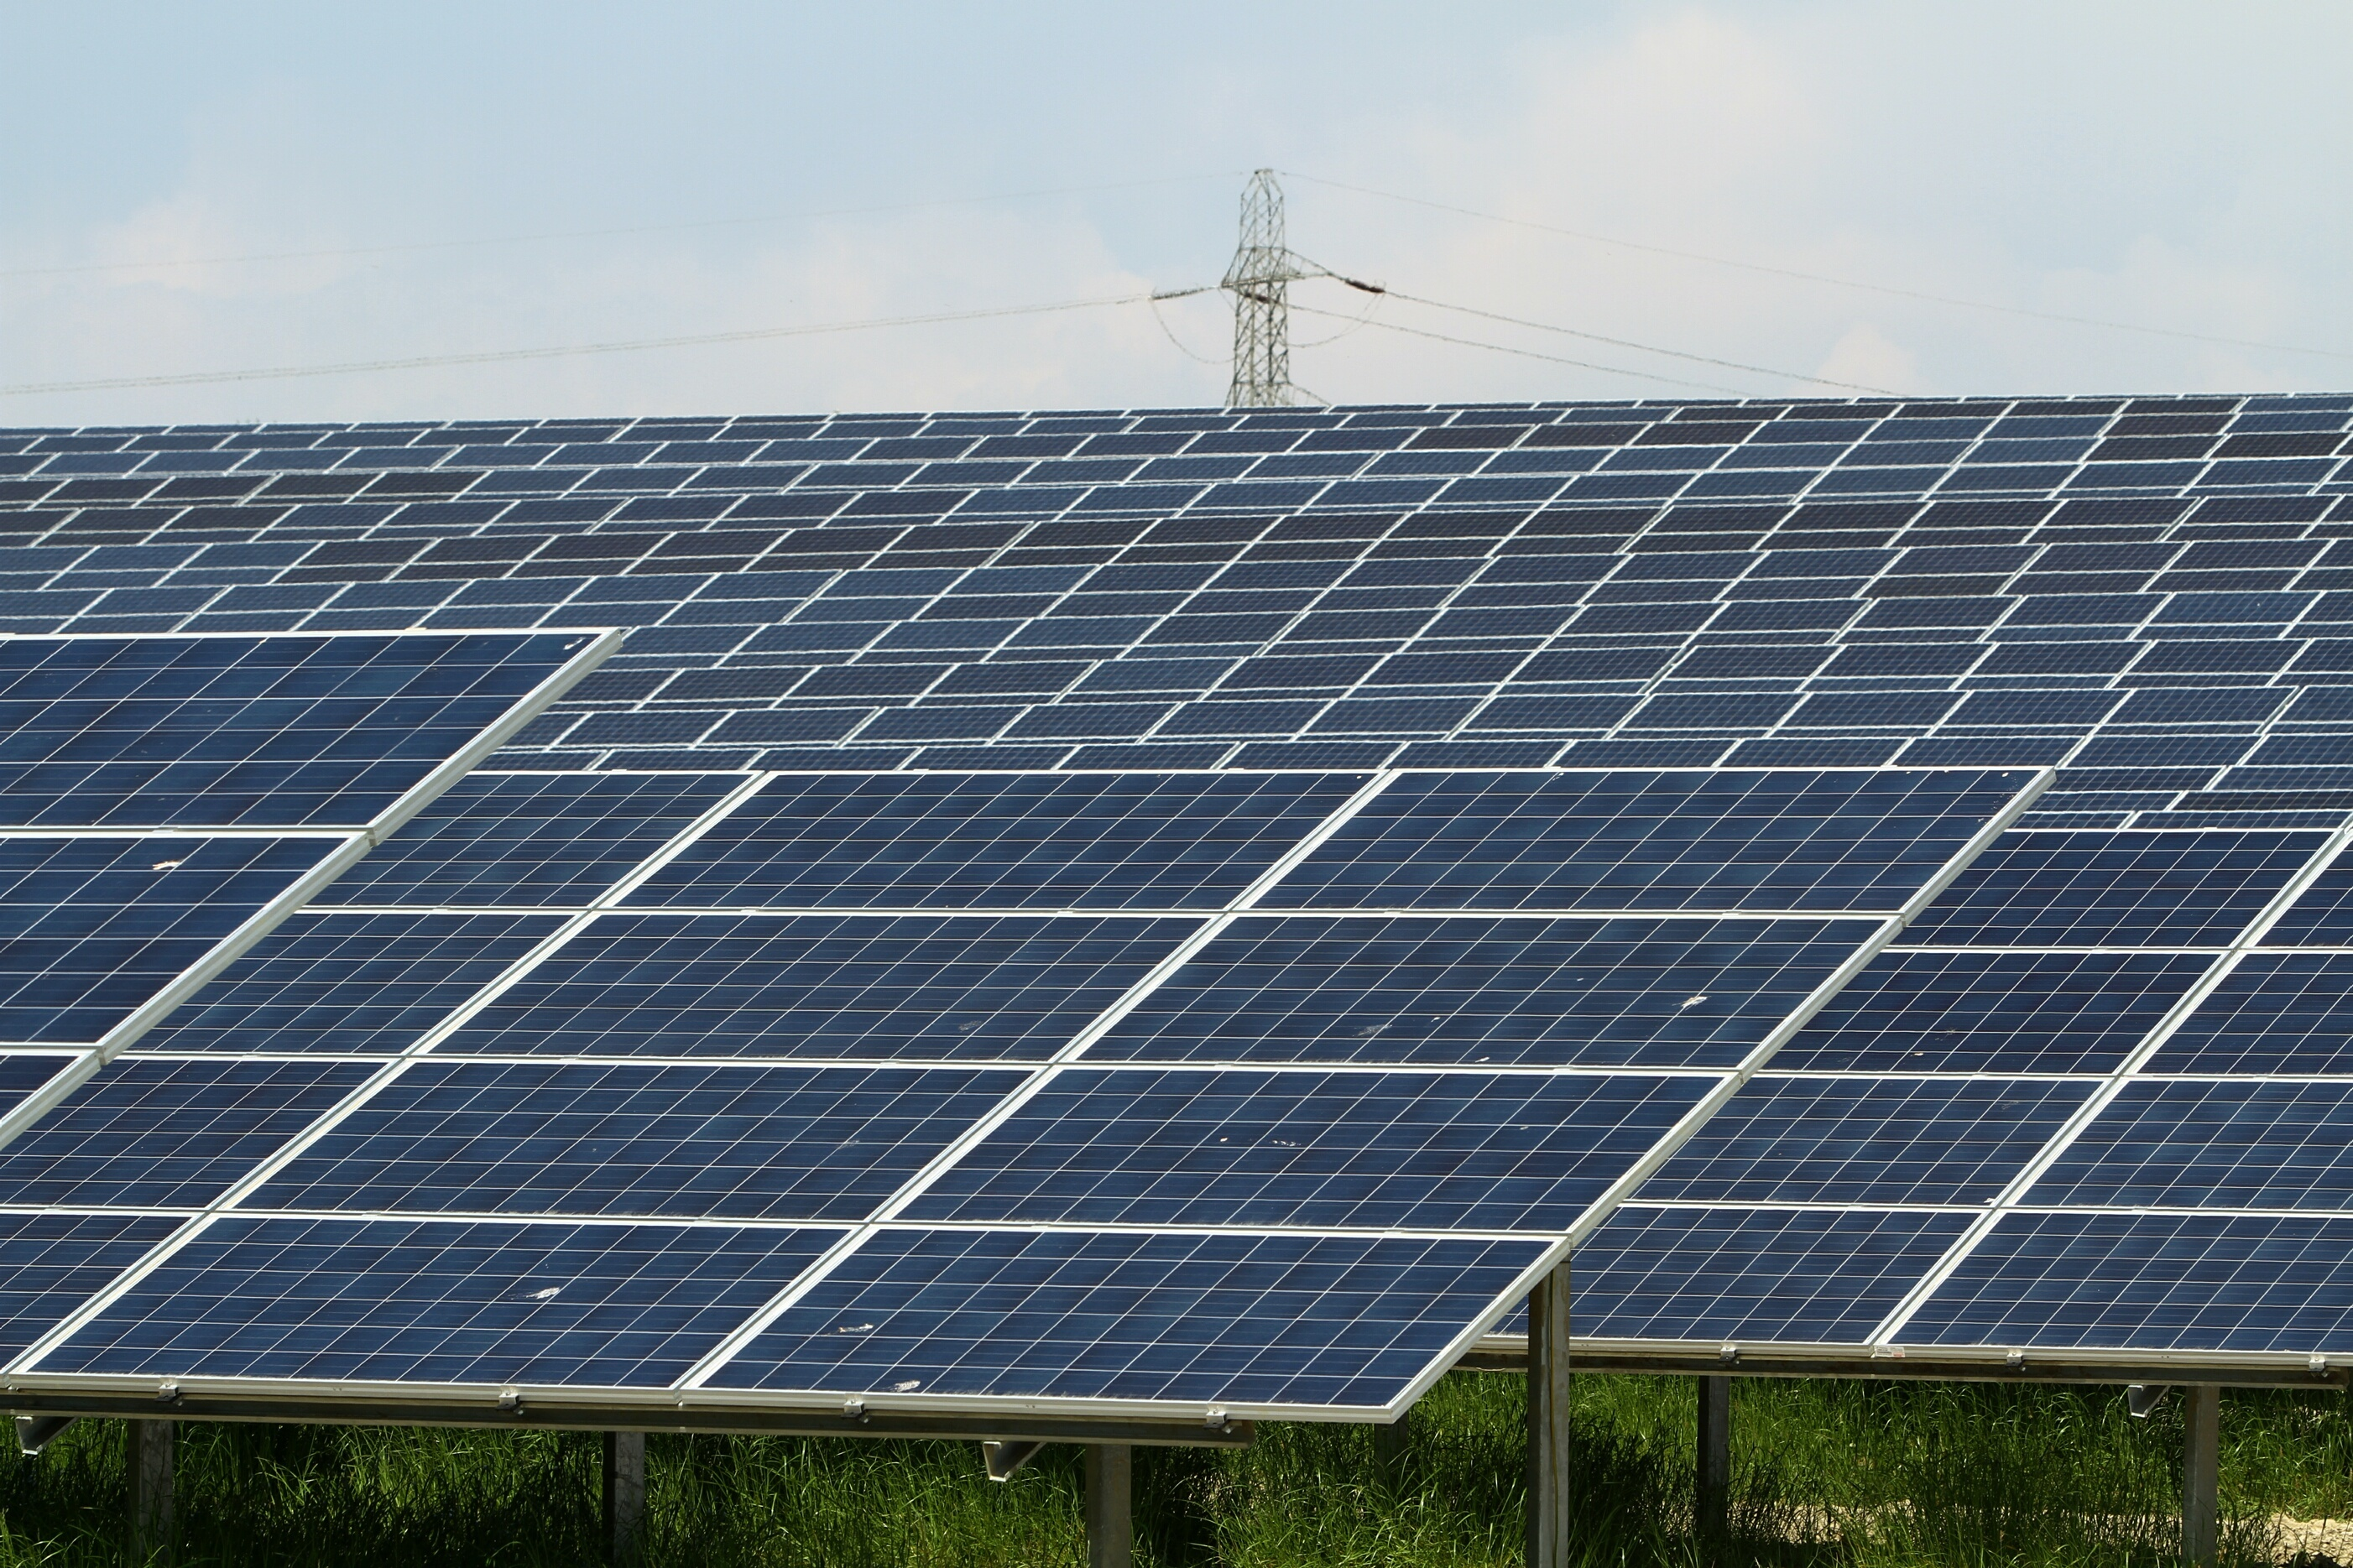 The solar farm near Errol